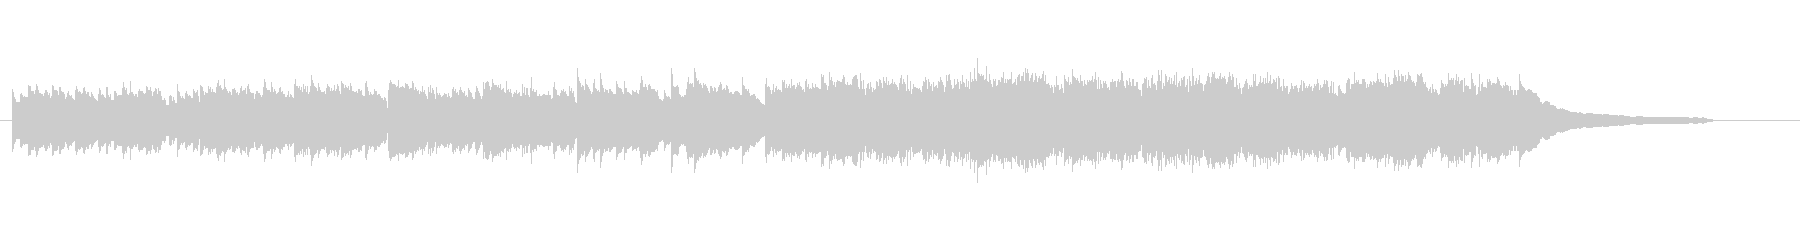 CM30秒/優しく感動的なピアノソロ24の未再生の波形